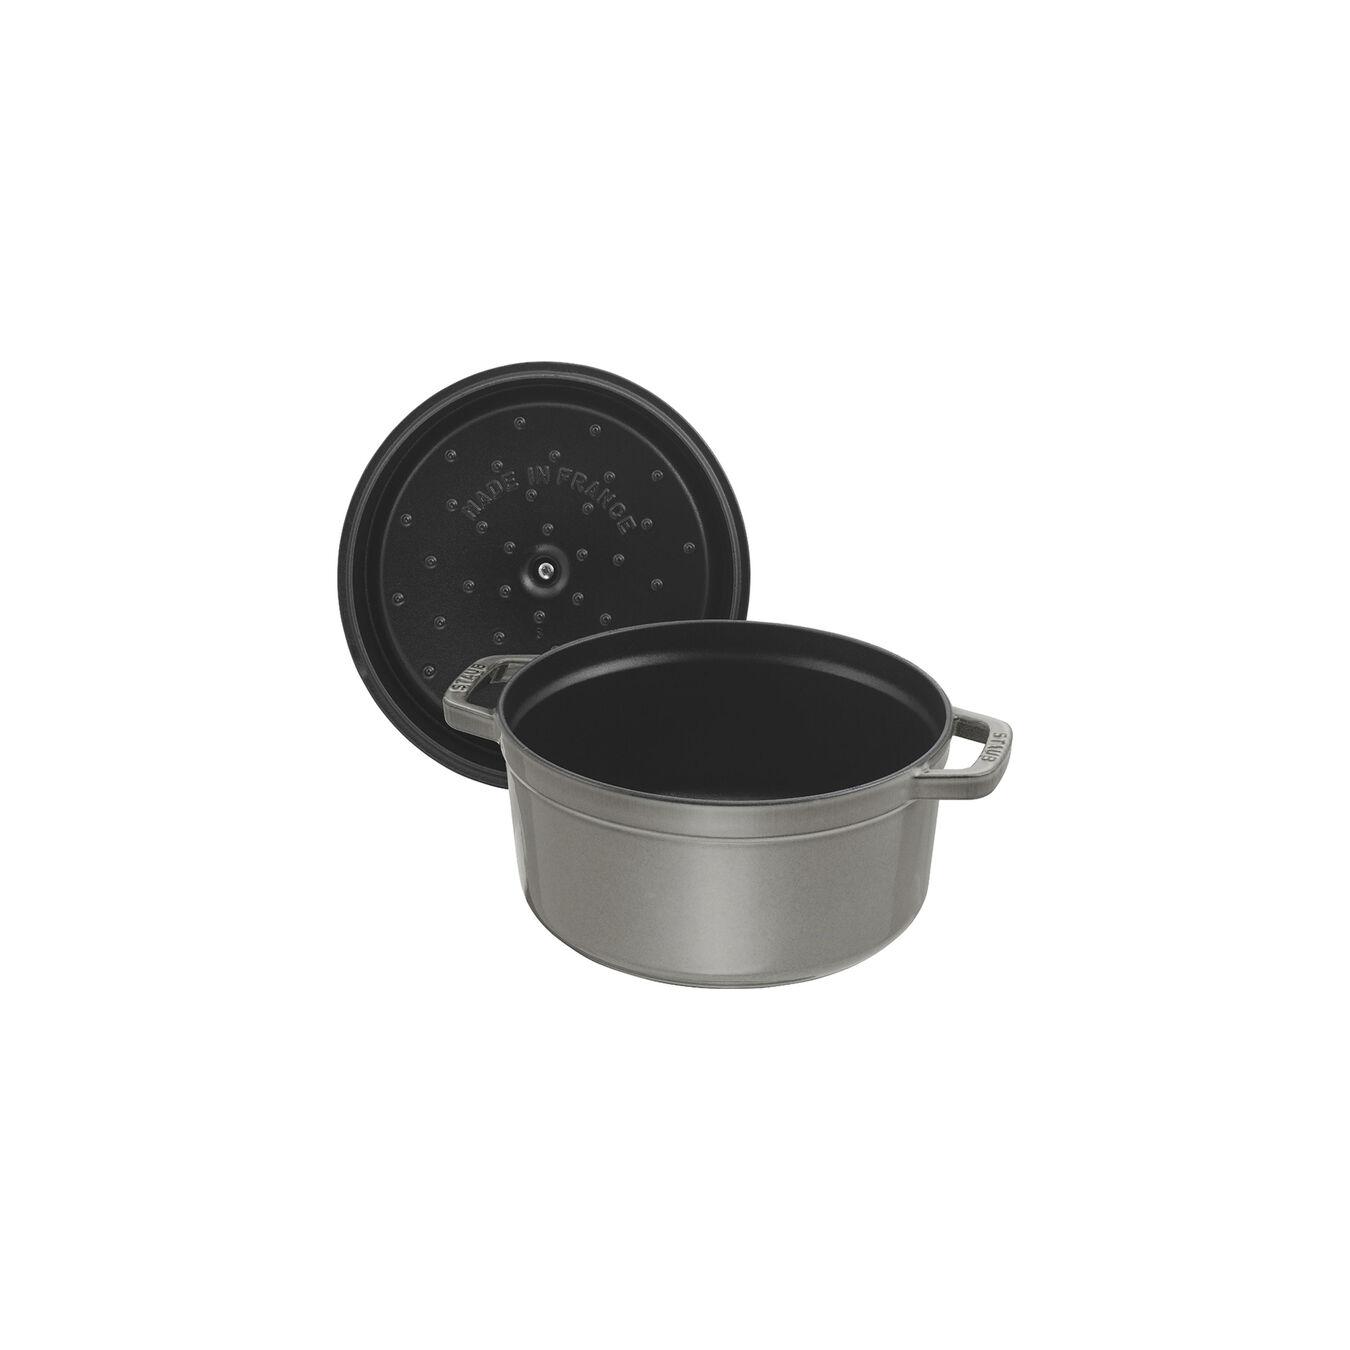 Cocotte rotonda - 20 cm, Colore grigio grafite,,large 4